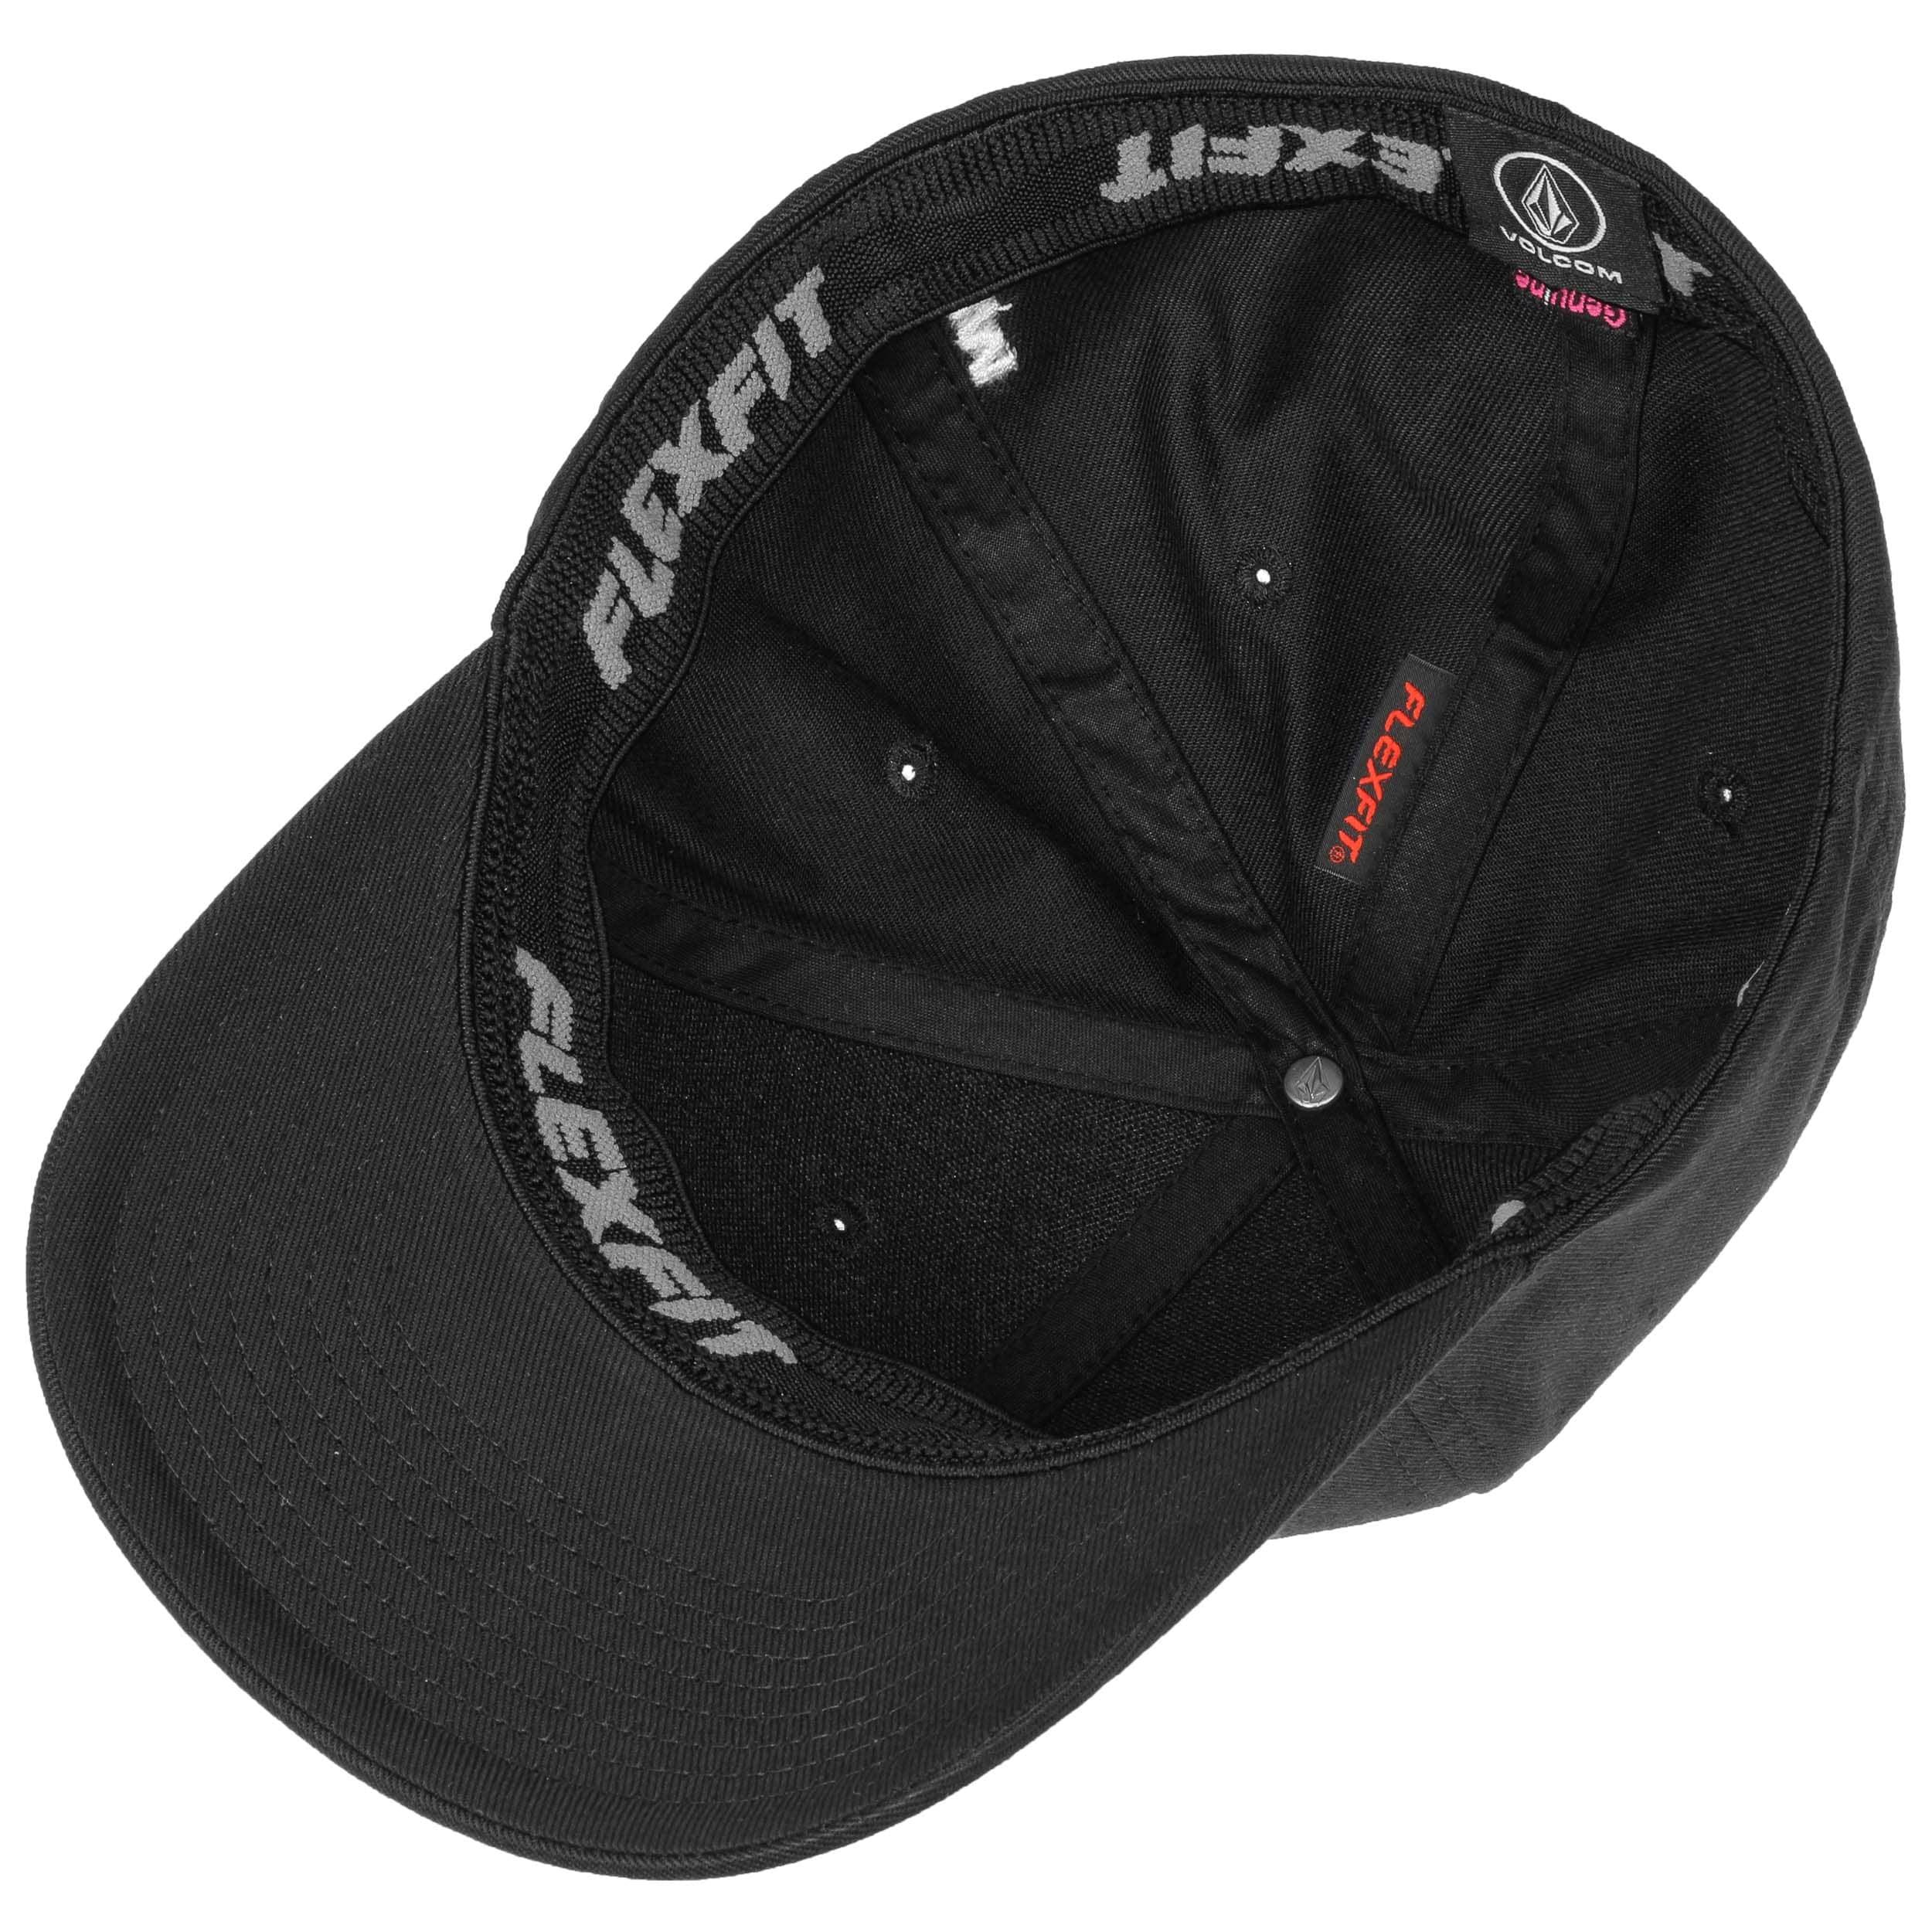 ... Full Stone Flexfit Cap by Volcom - black 2 ... 0d6e883dfc8b